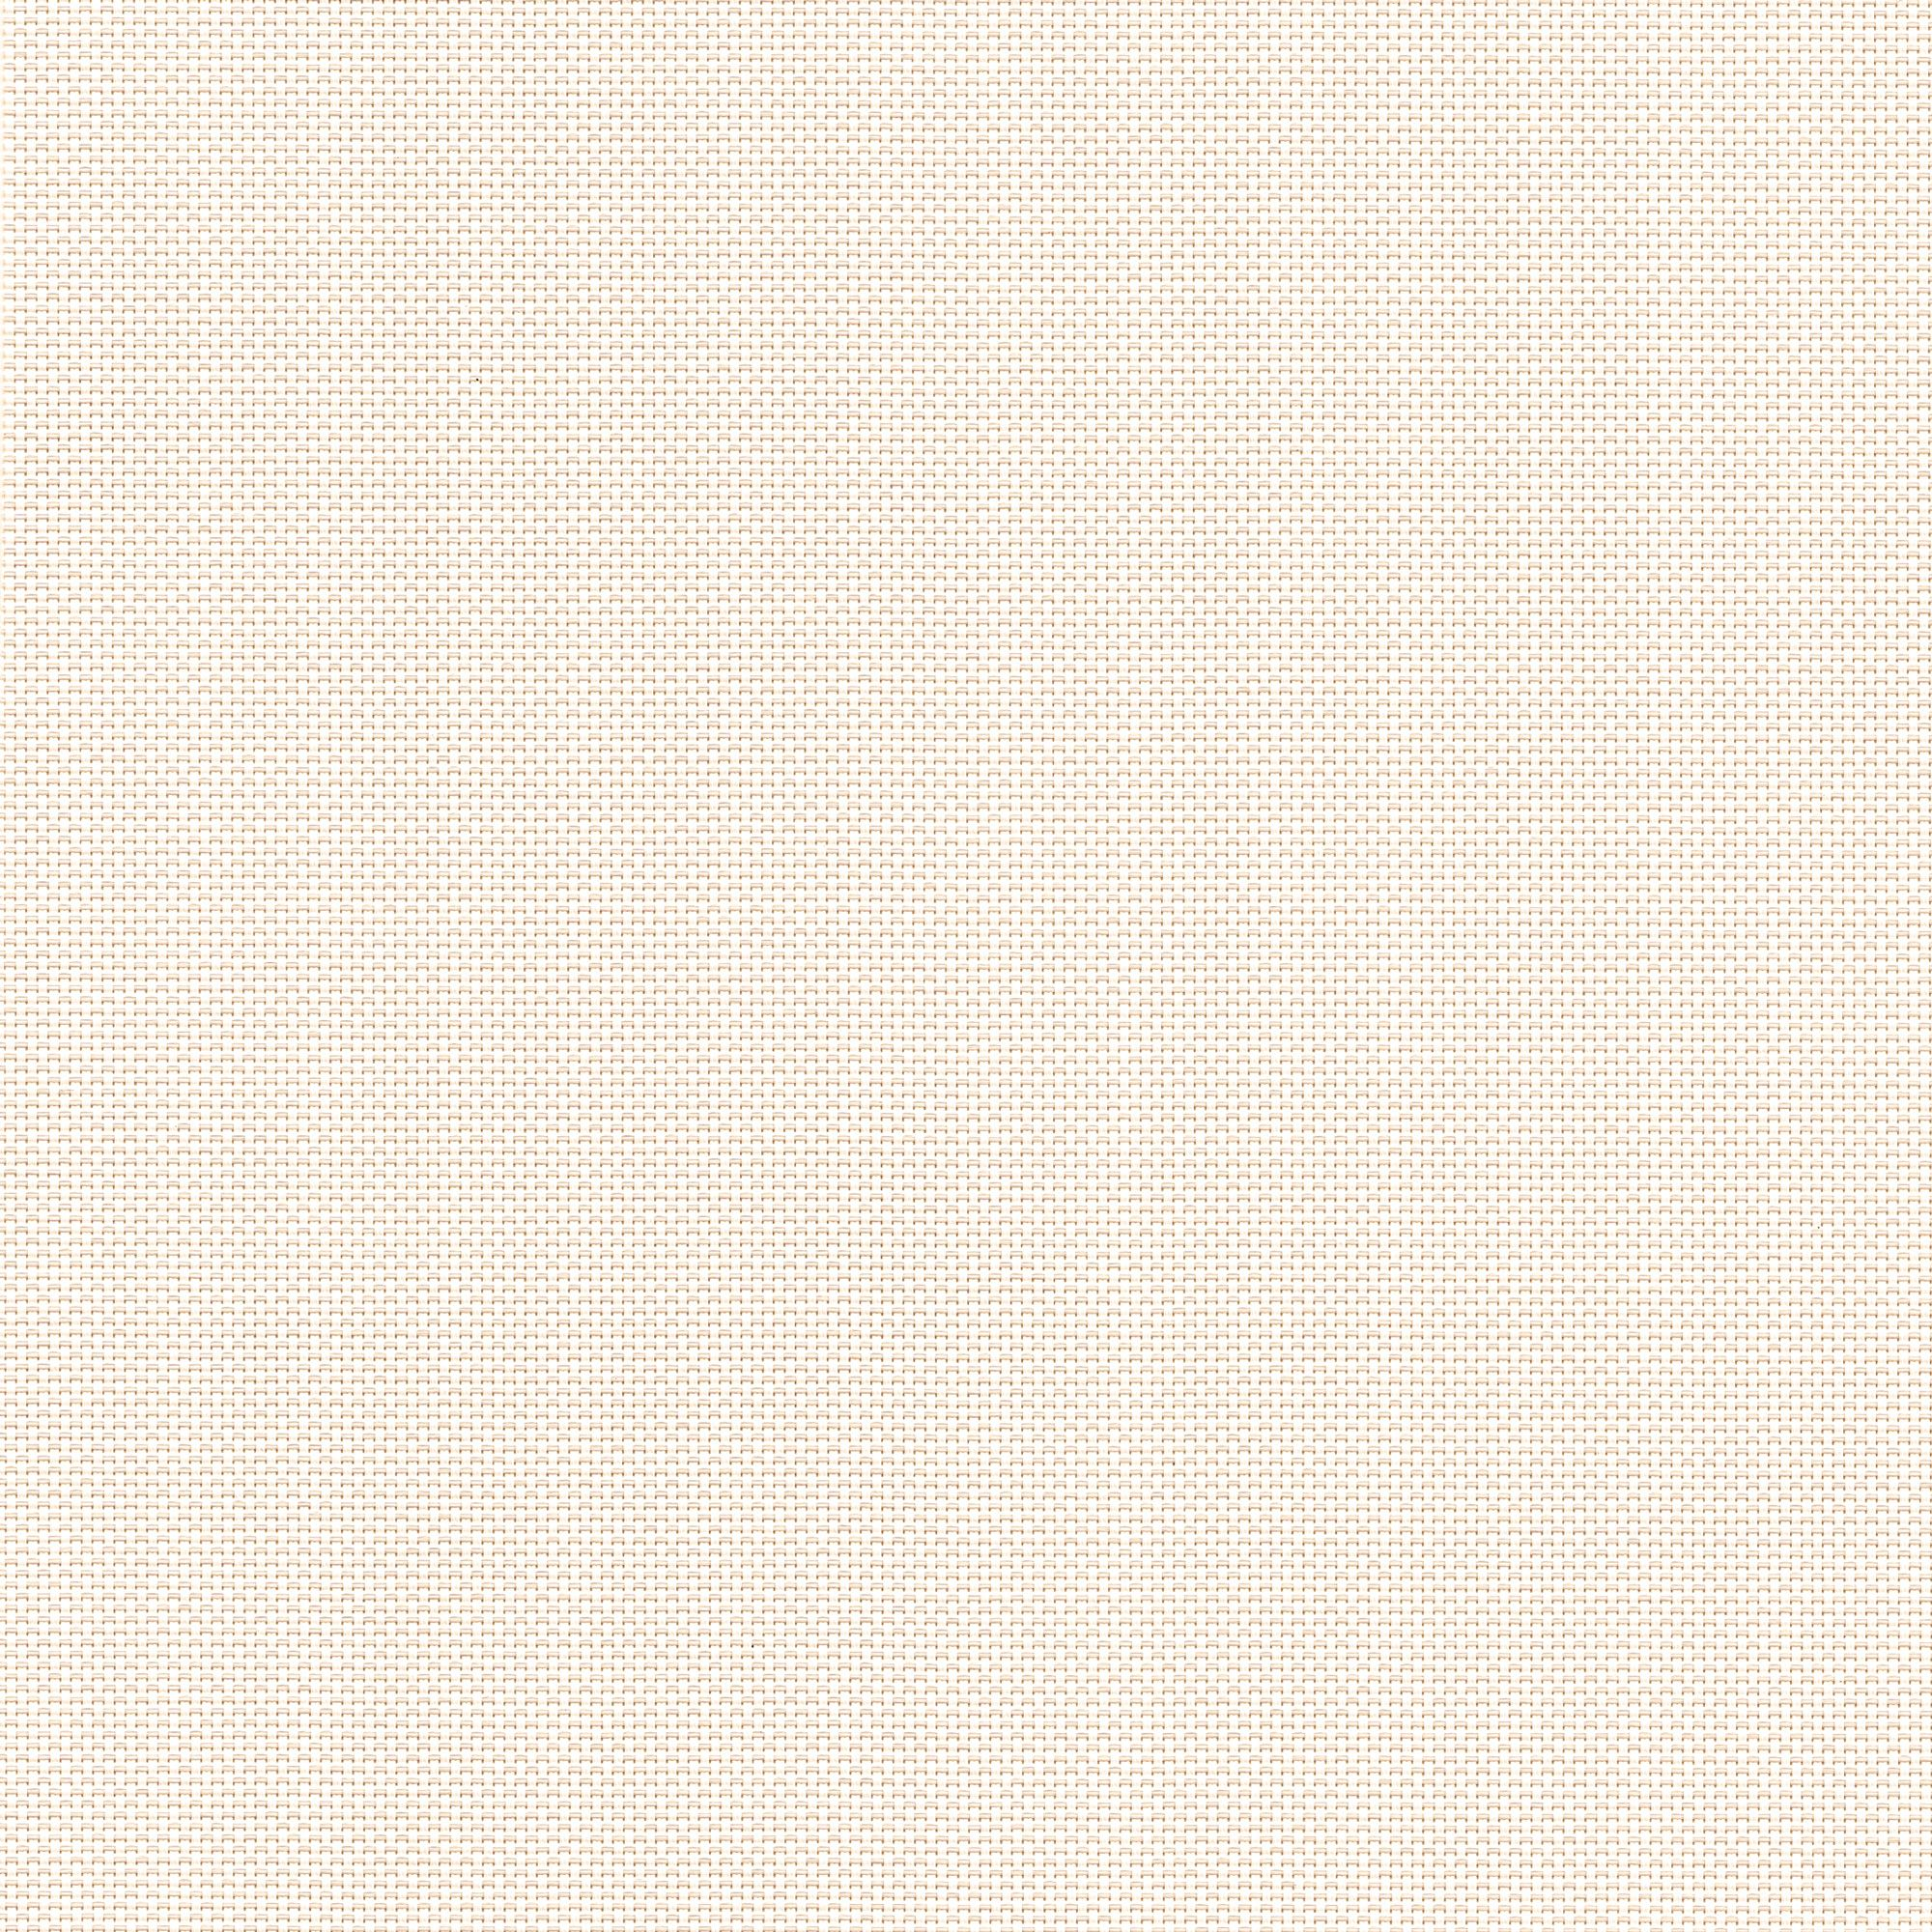 Nordic Screen BW White-White-Pearl